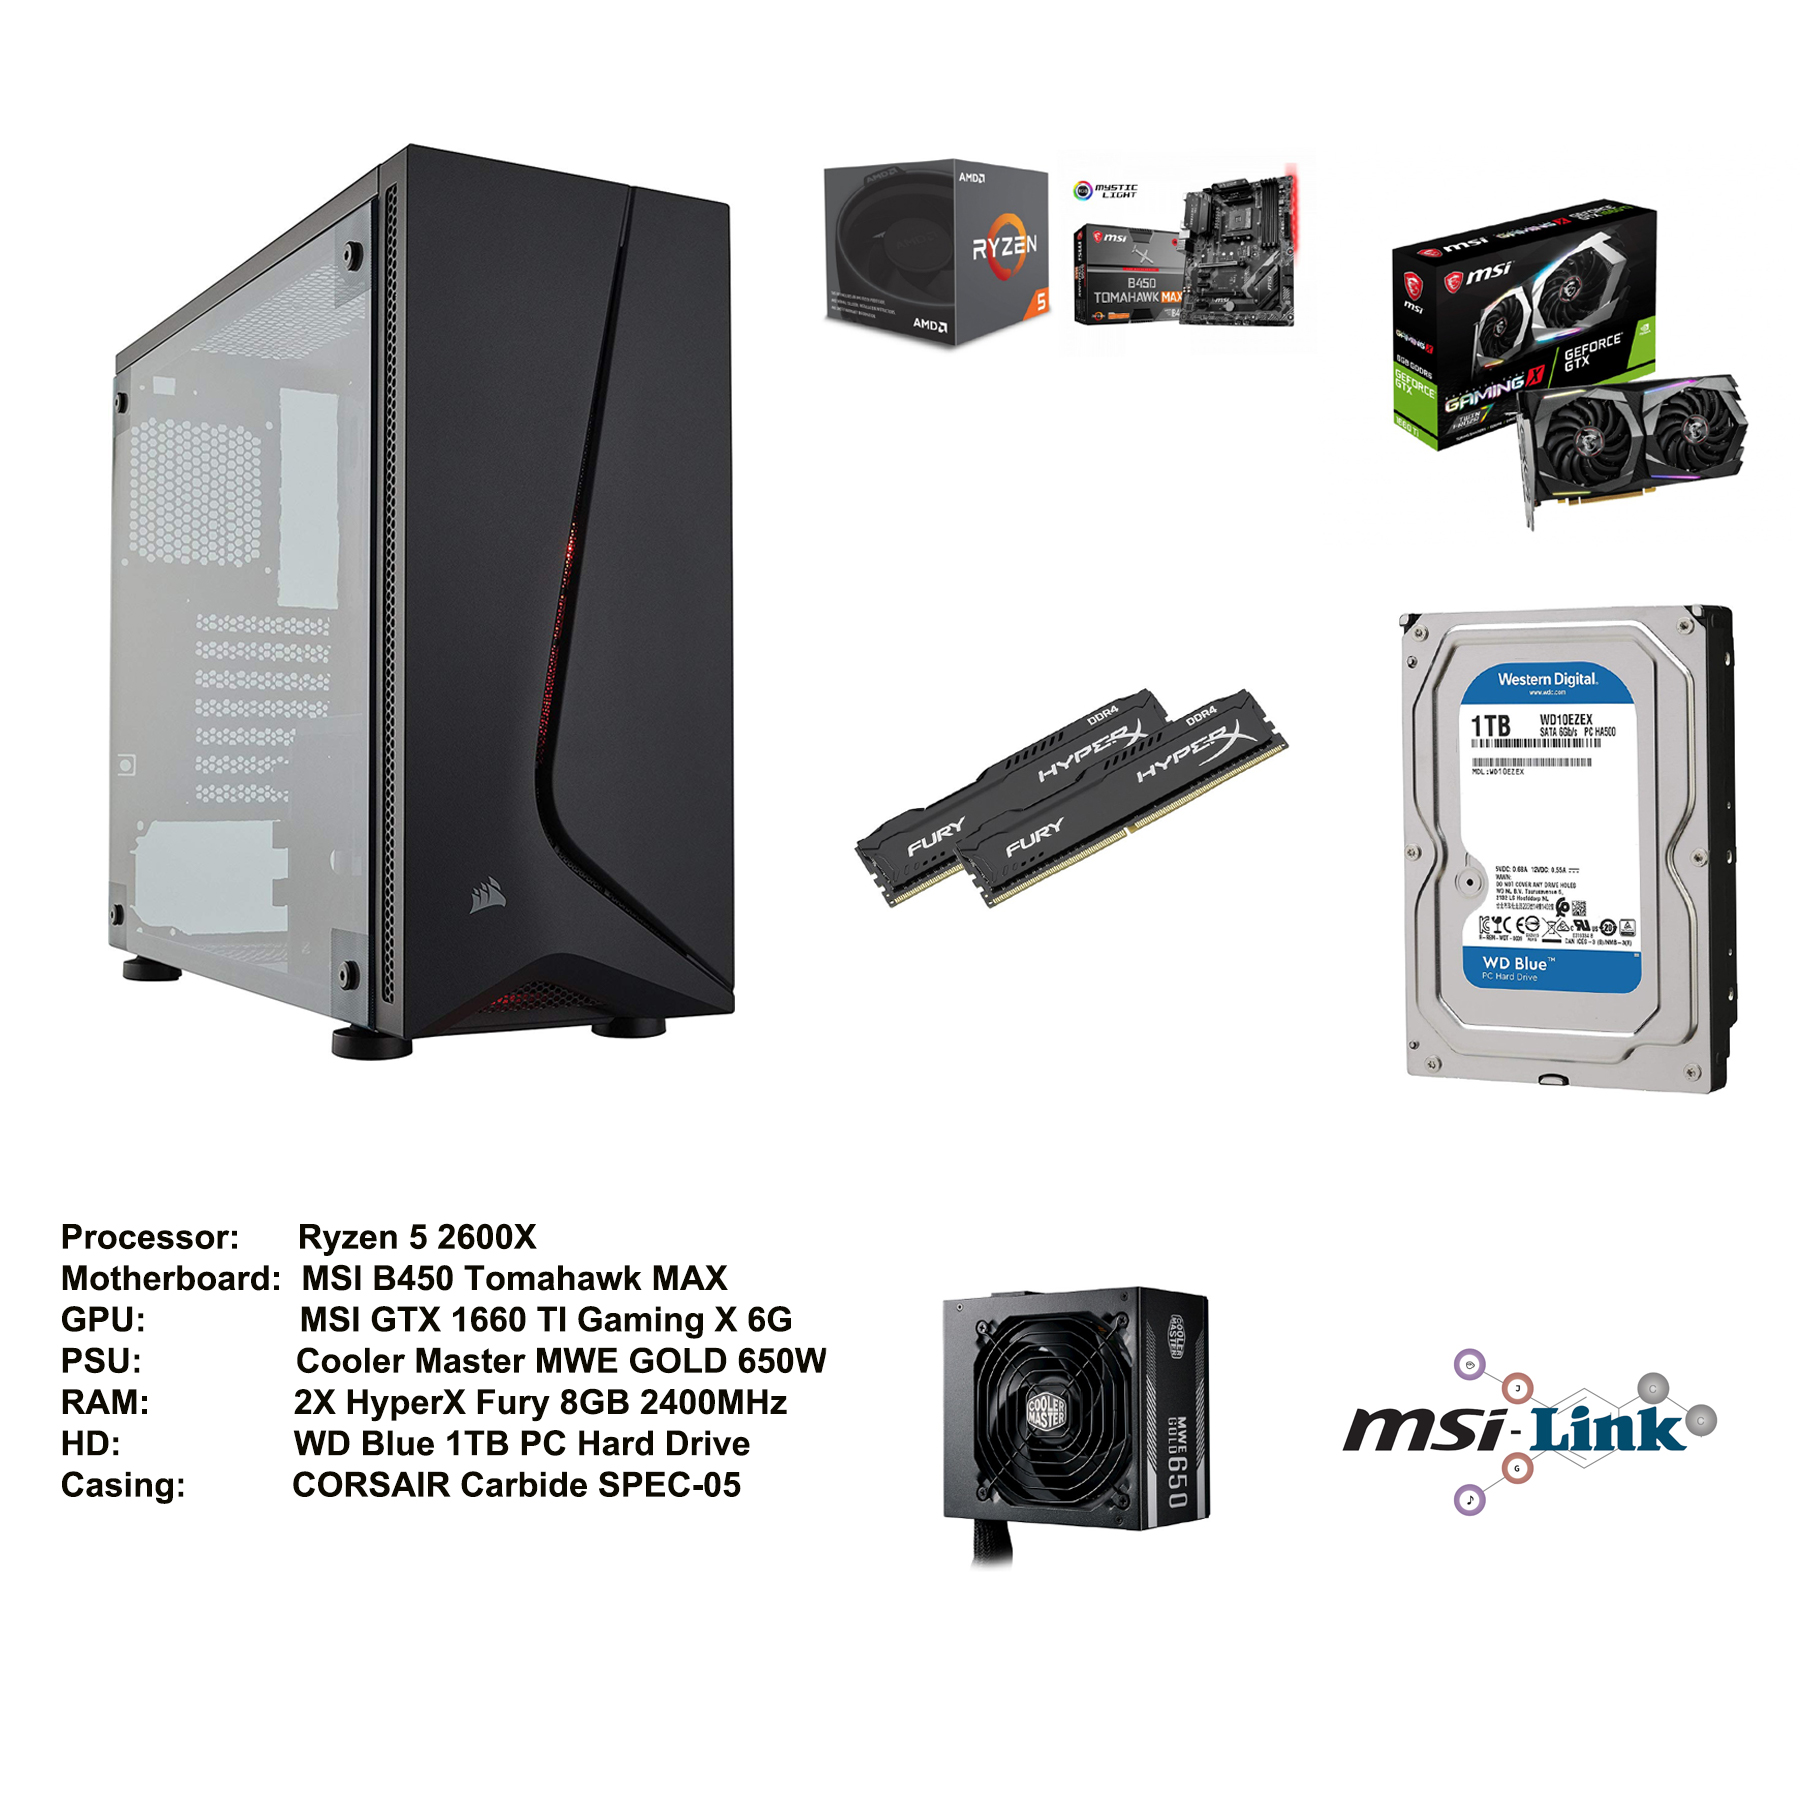 AMD Ryzen 2600X Processor and MSI Bundle: Ryzen 5 2600X, MSI B450 Tomahawk  MAX Motherboard , MSI GTX 1660 TI Gaming X 6G , Cooler Master MWE GOLD 650W